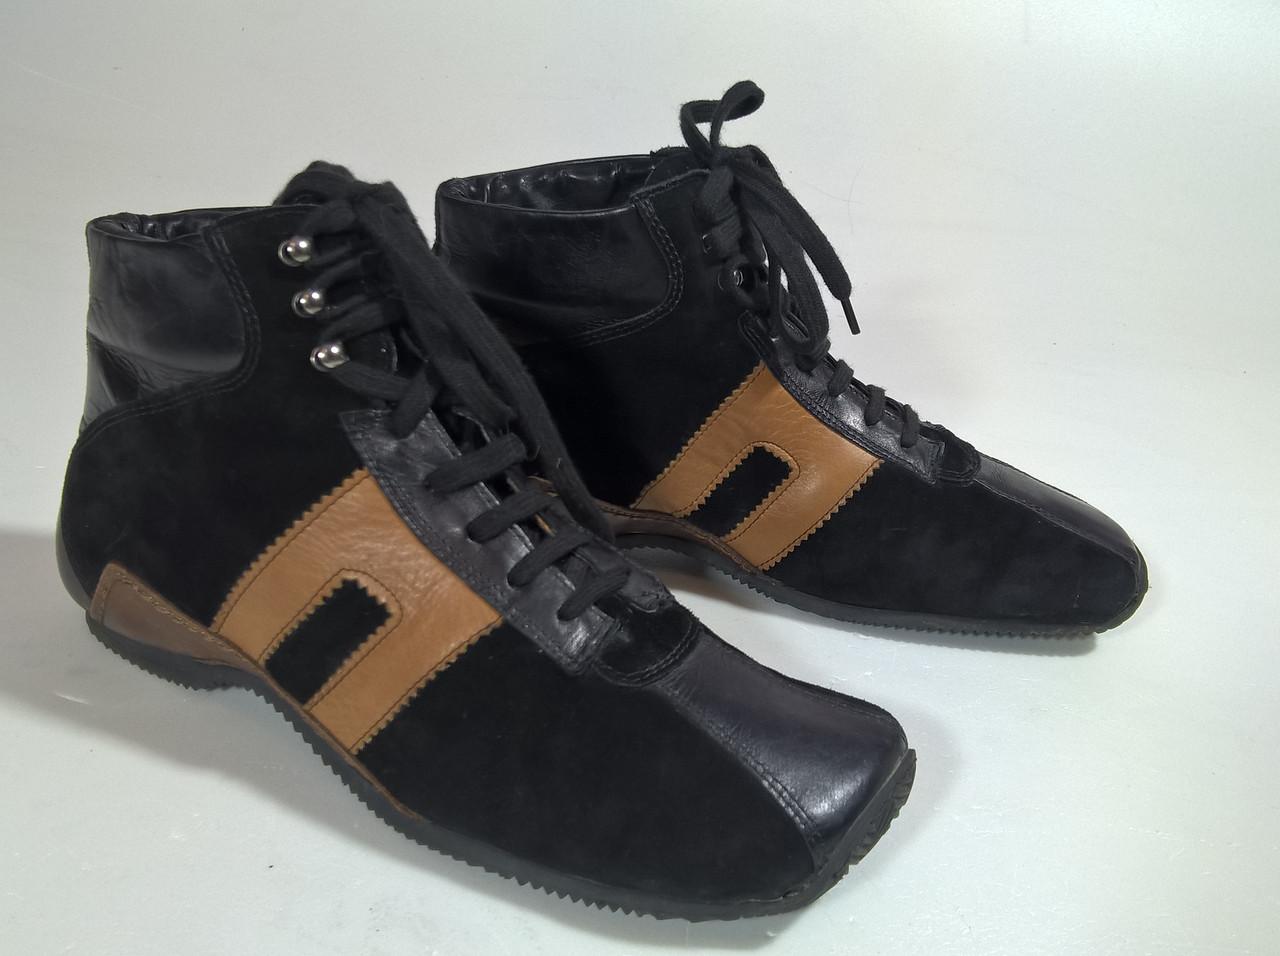 Ботинки женские 40 размер бренд AIR STEP (Италия)